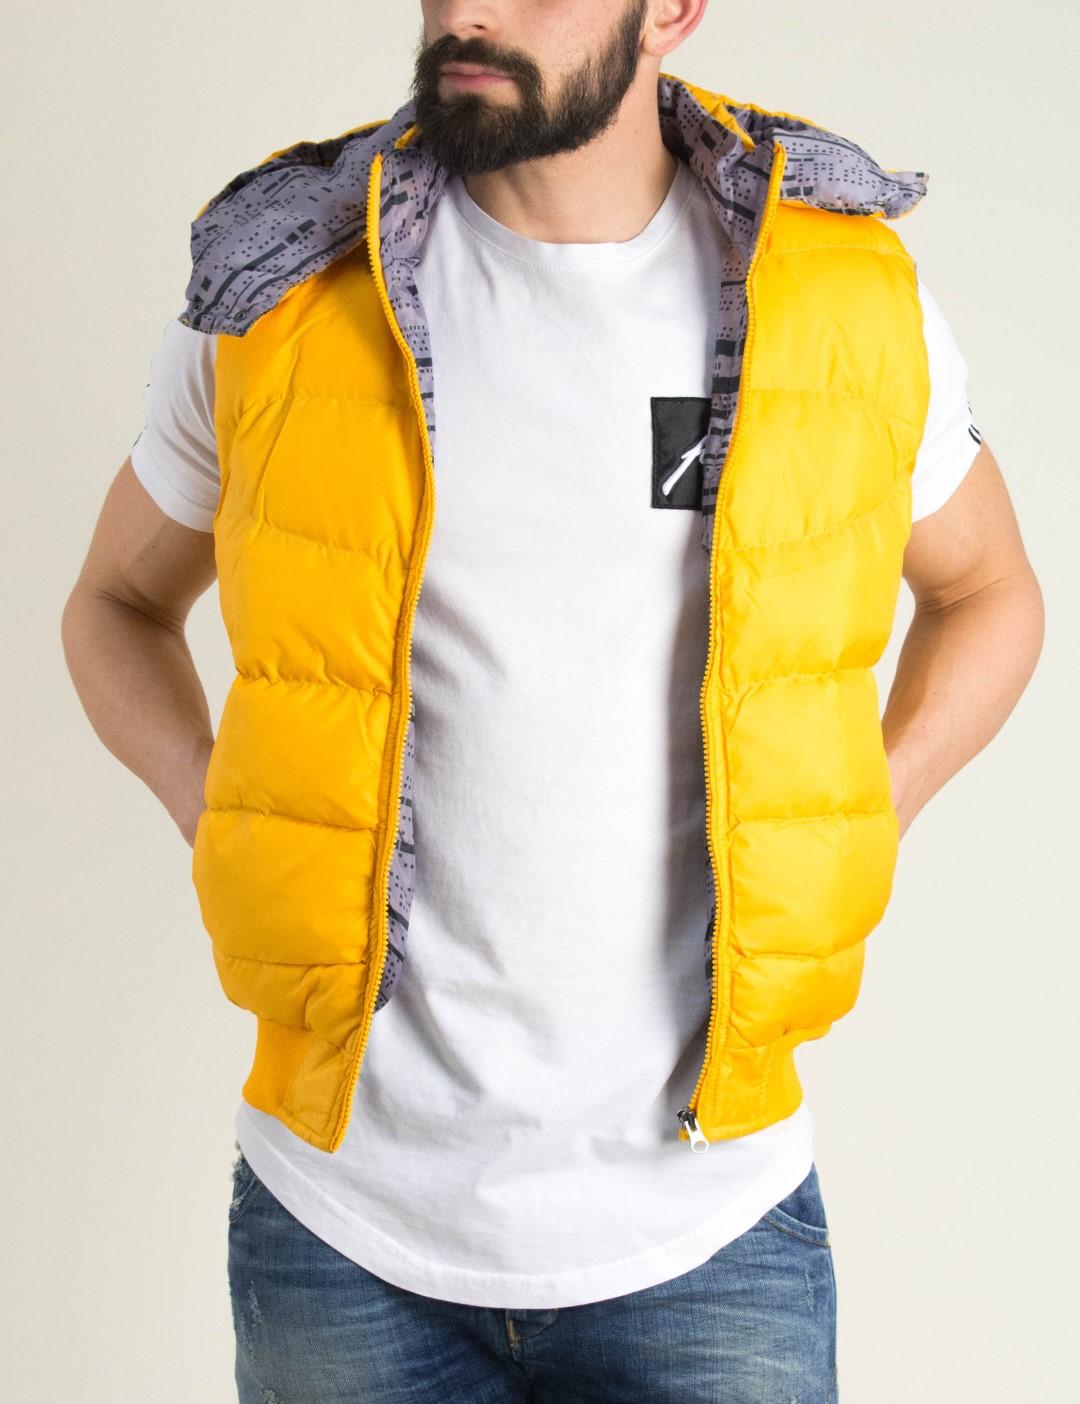 257689e8428c Ανδρικό κίτρινο αμάνικο Jacket κουκούλα Madmext 2789R